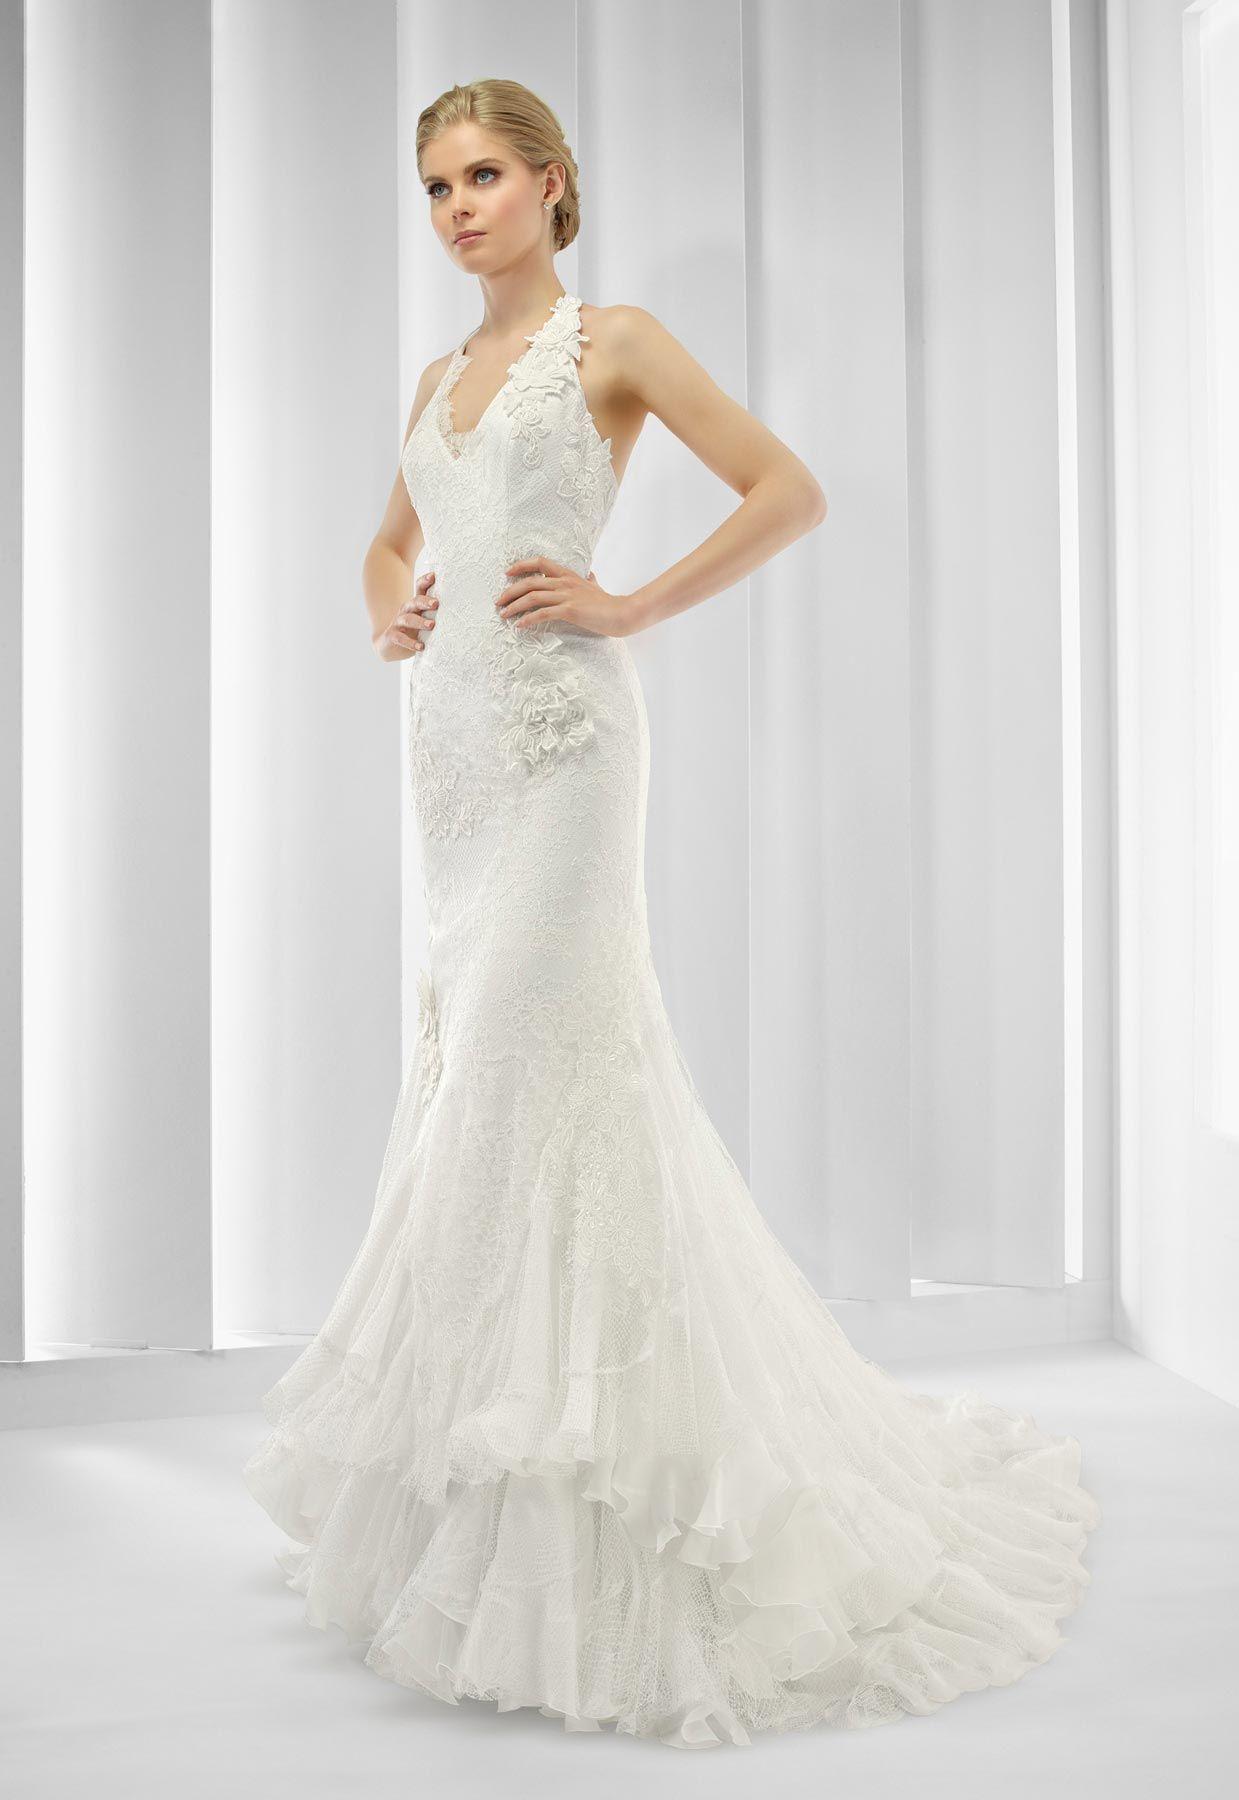 Vestido de novia Patricia Avendaño modelo 2573 en Eva Novias. #novias #patriciaavendaño #coleccion2015 #vestidosdenovia Via: http://goo.gl/BUv3YW